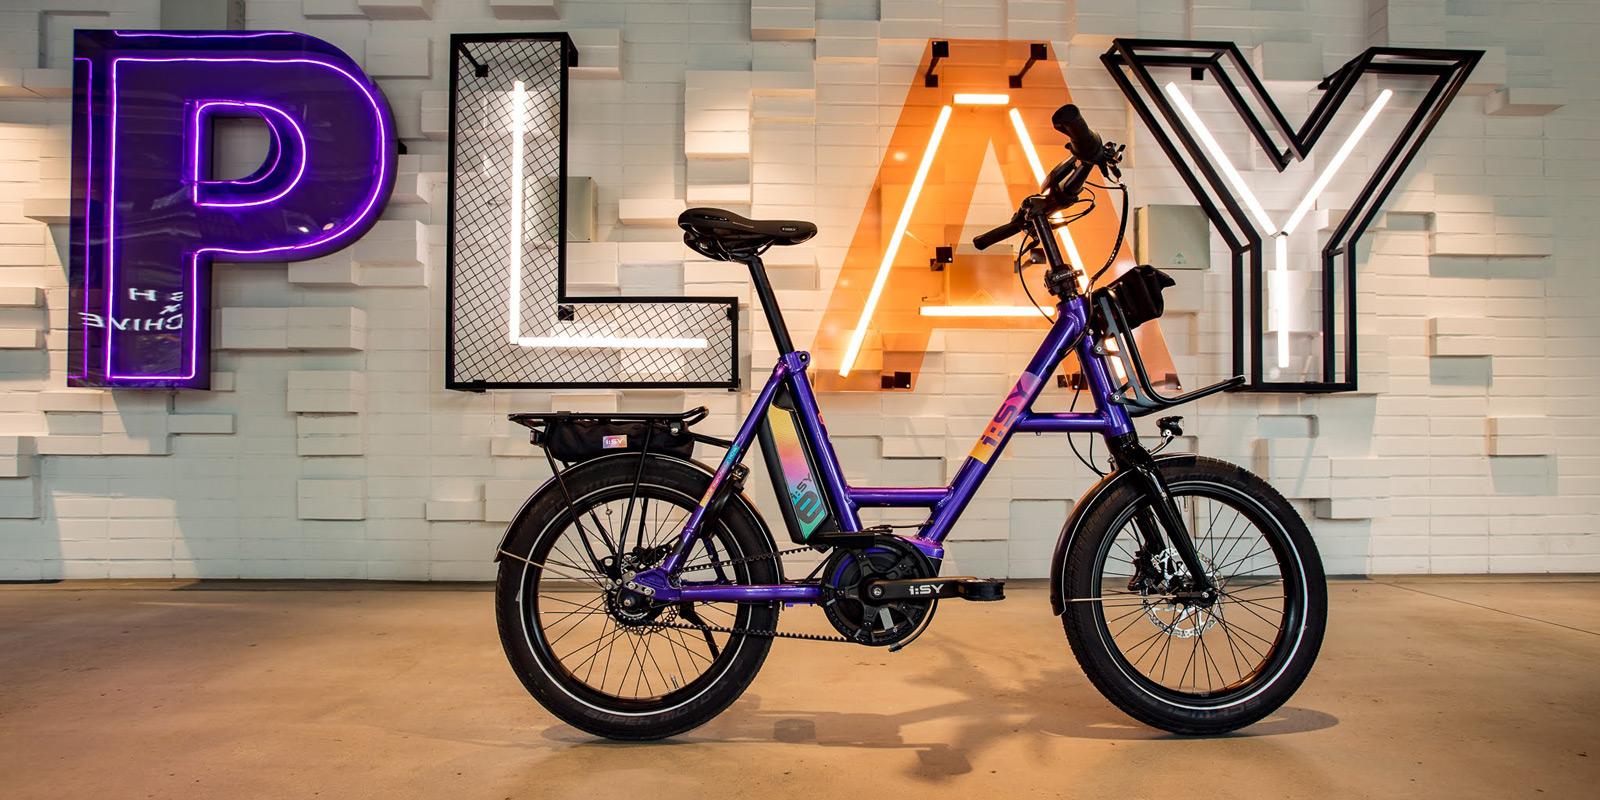 ISY Ebike Fahrradladen